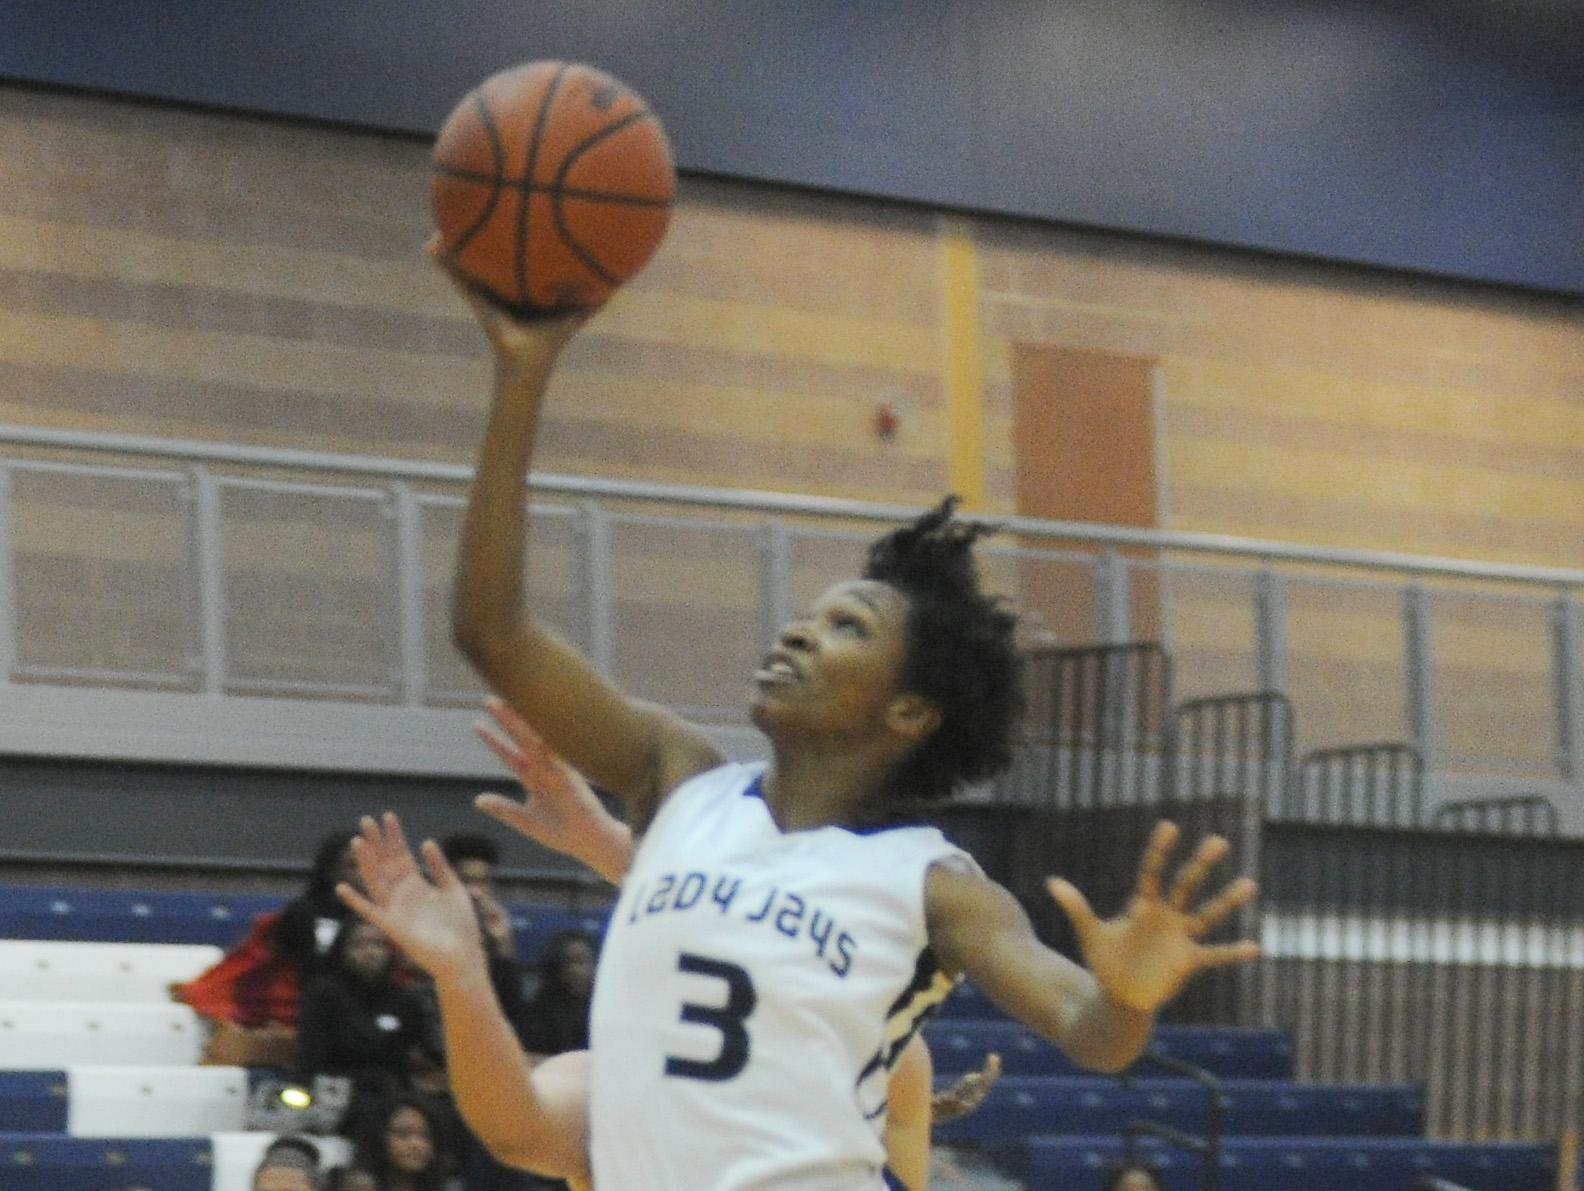 Southfield's Tyler Washington goes to the basket for a layup.